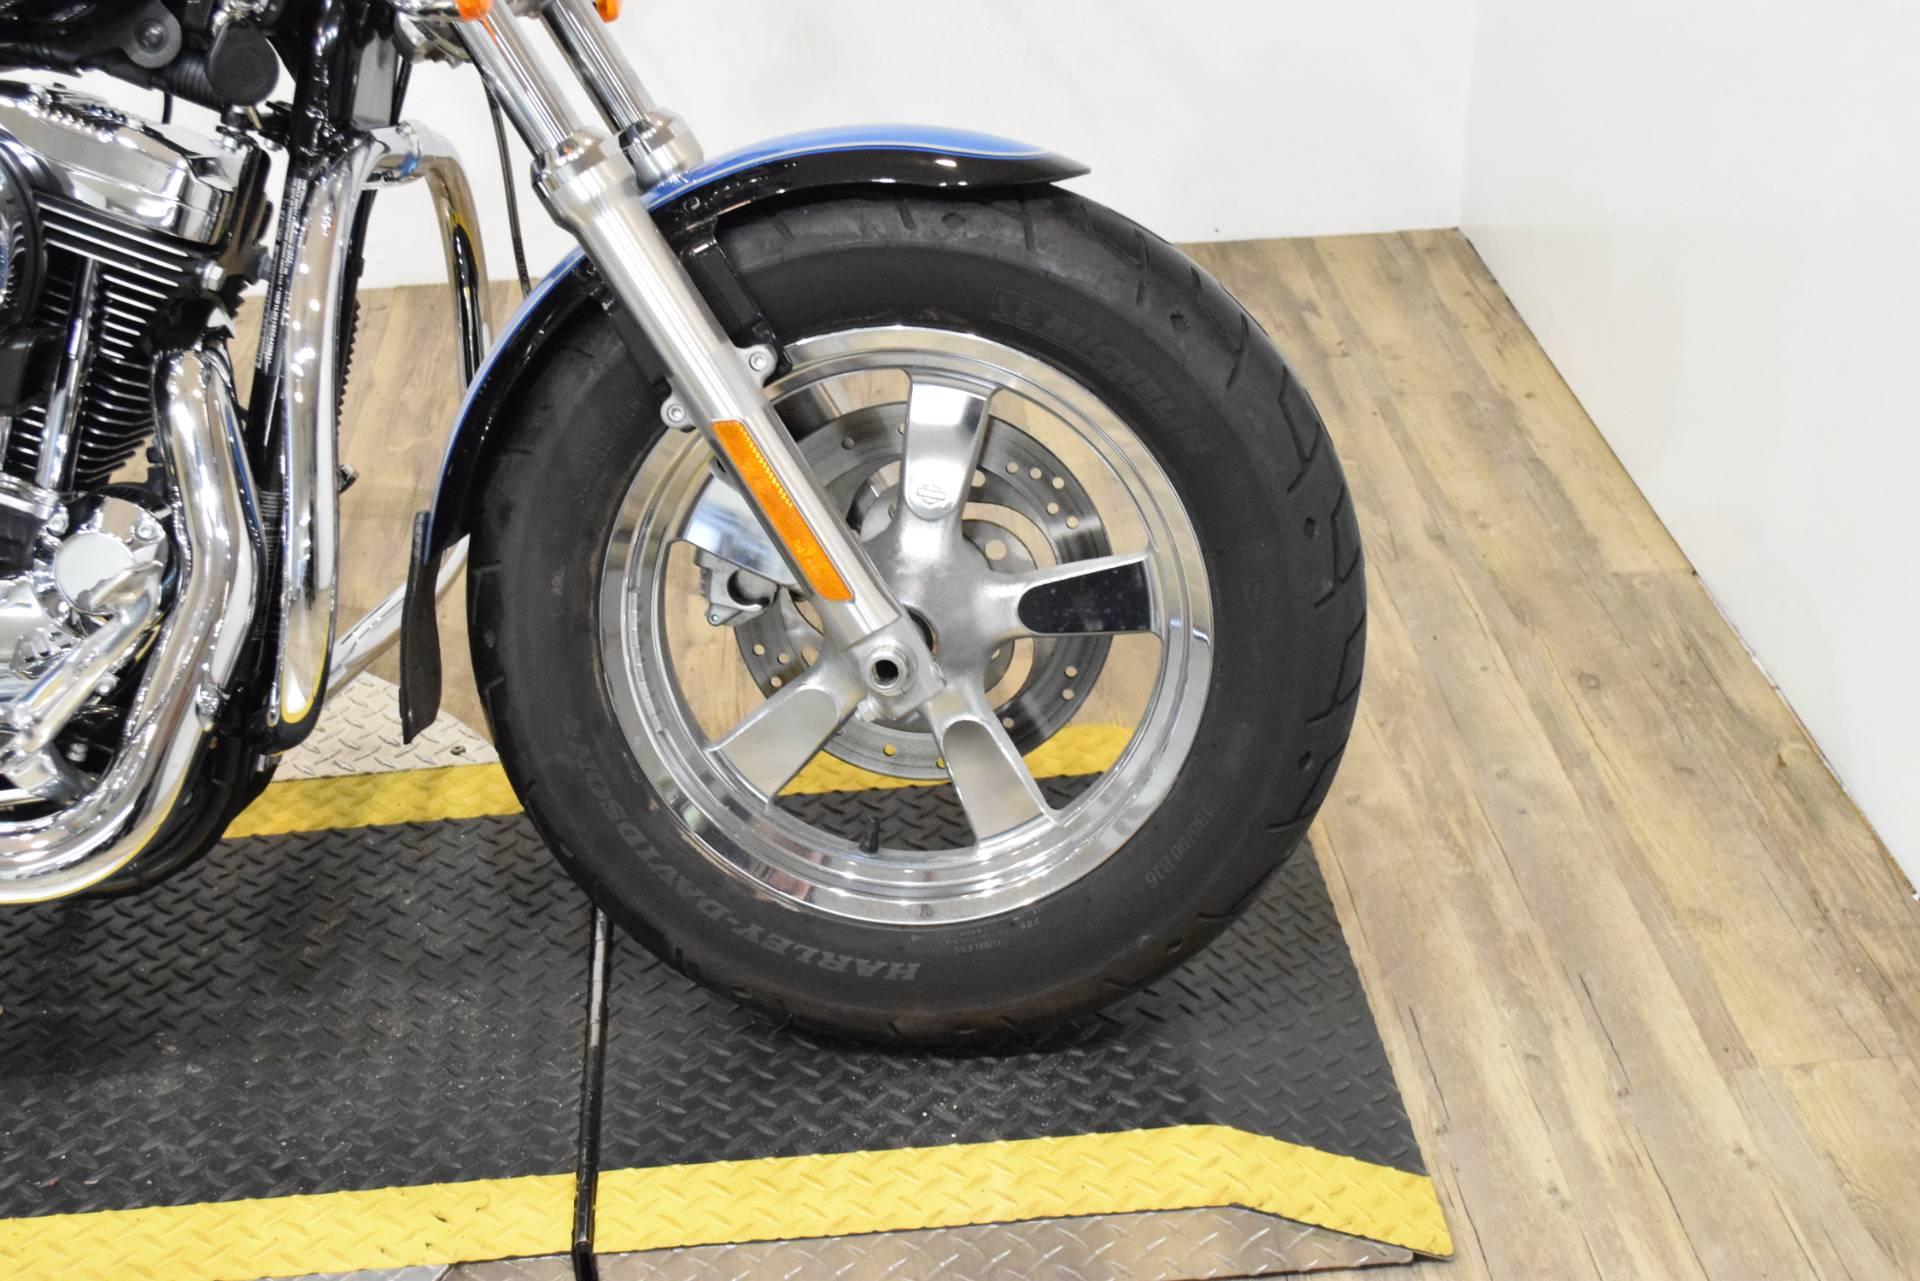 2012 Harley-Davidson XL1200C 2